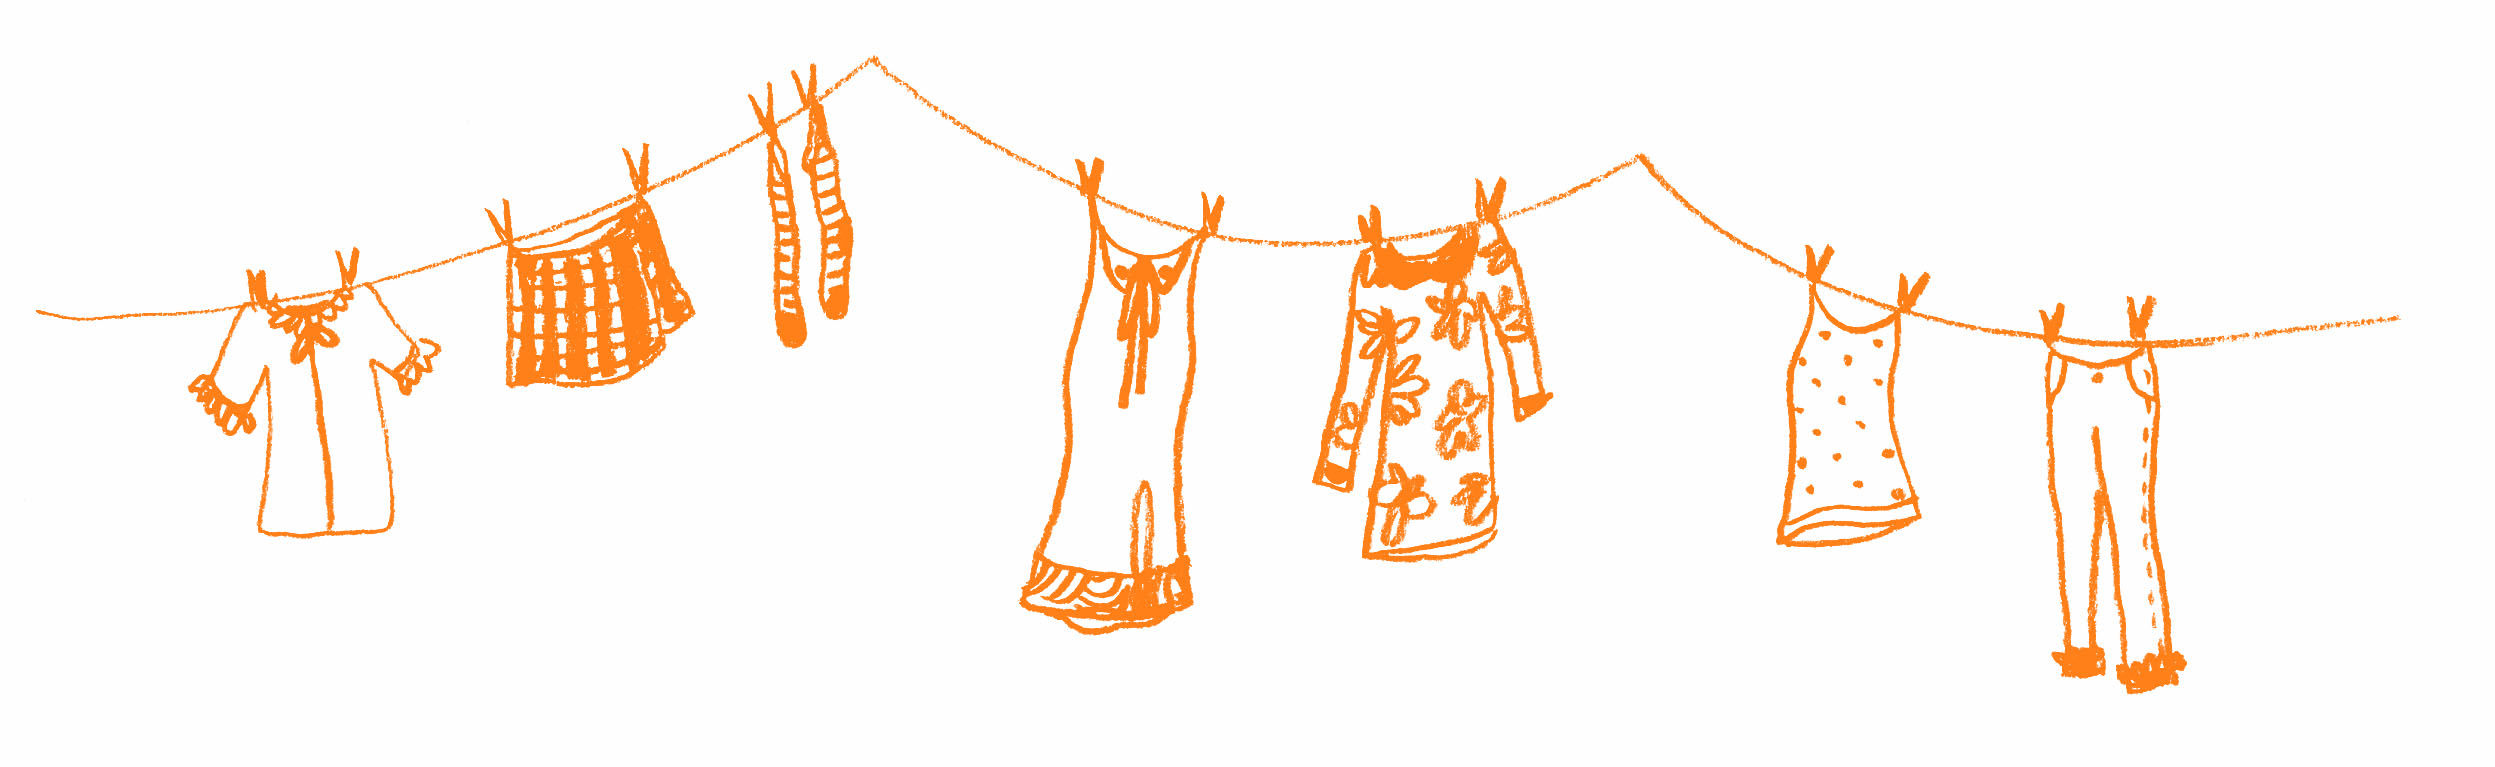 roupas desenhos coloridos desenho de diversas roupas para colorir